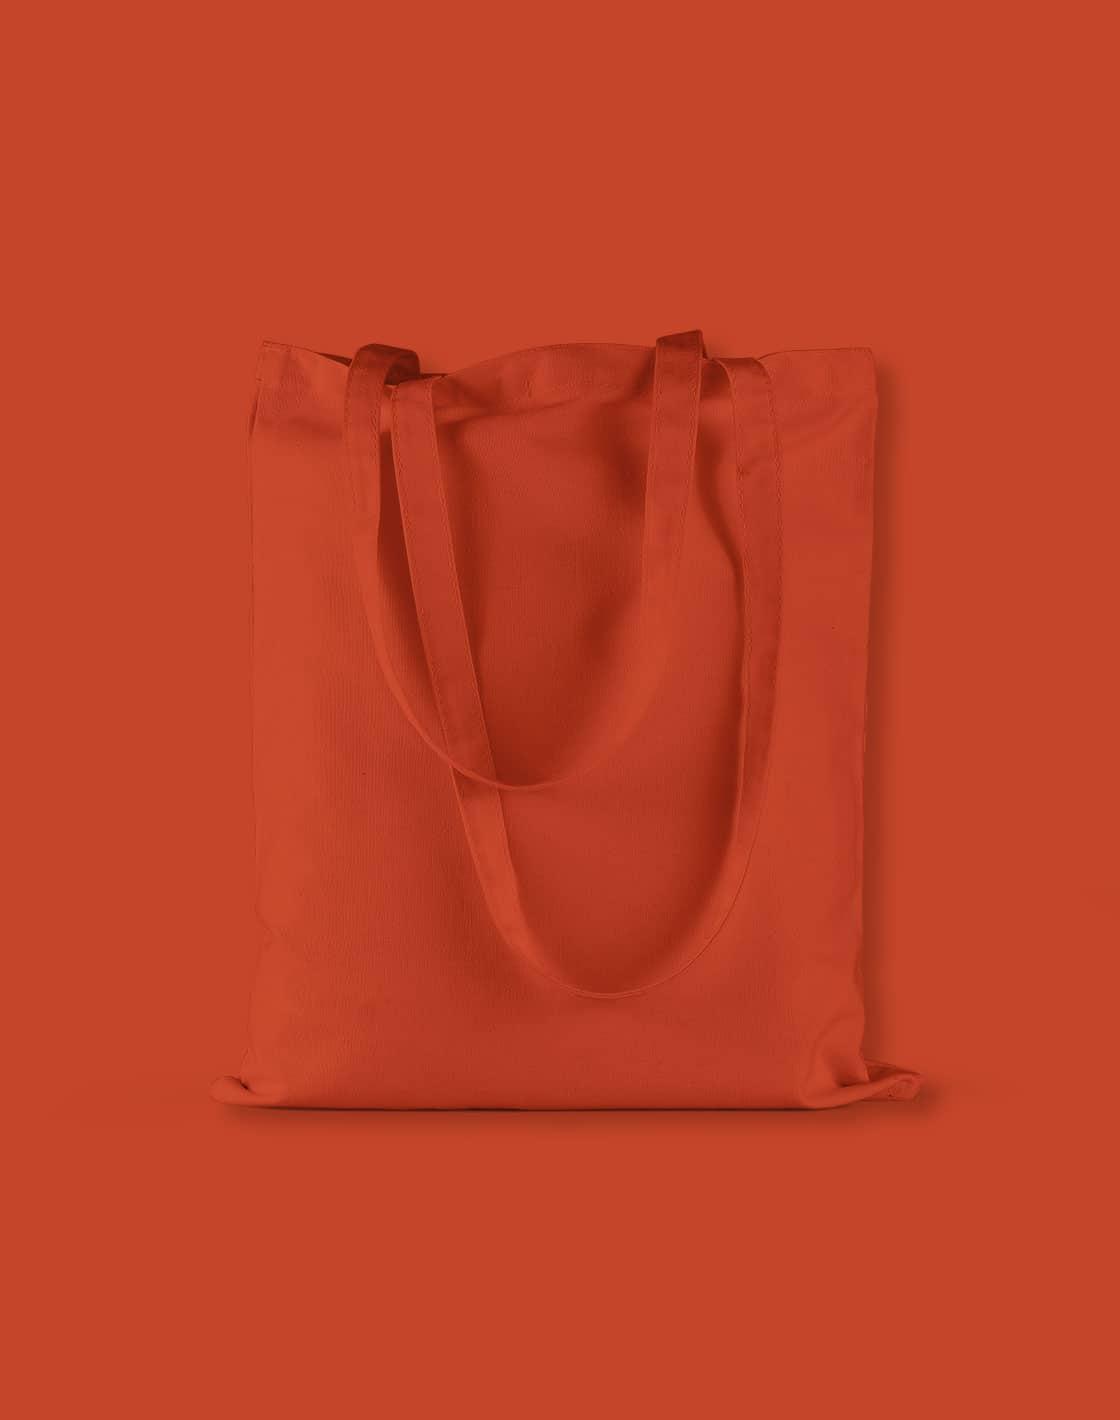 baumwolltaschen bunt orange rust lange henkel 38x42cm